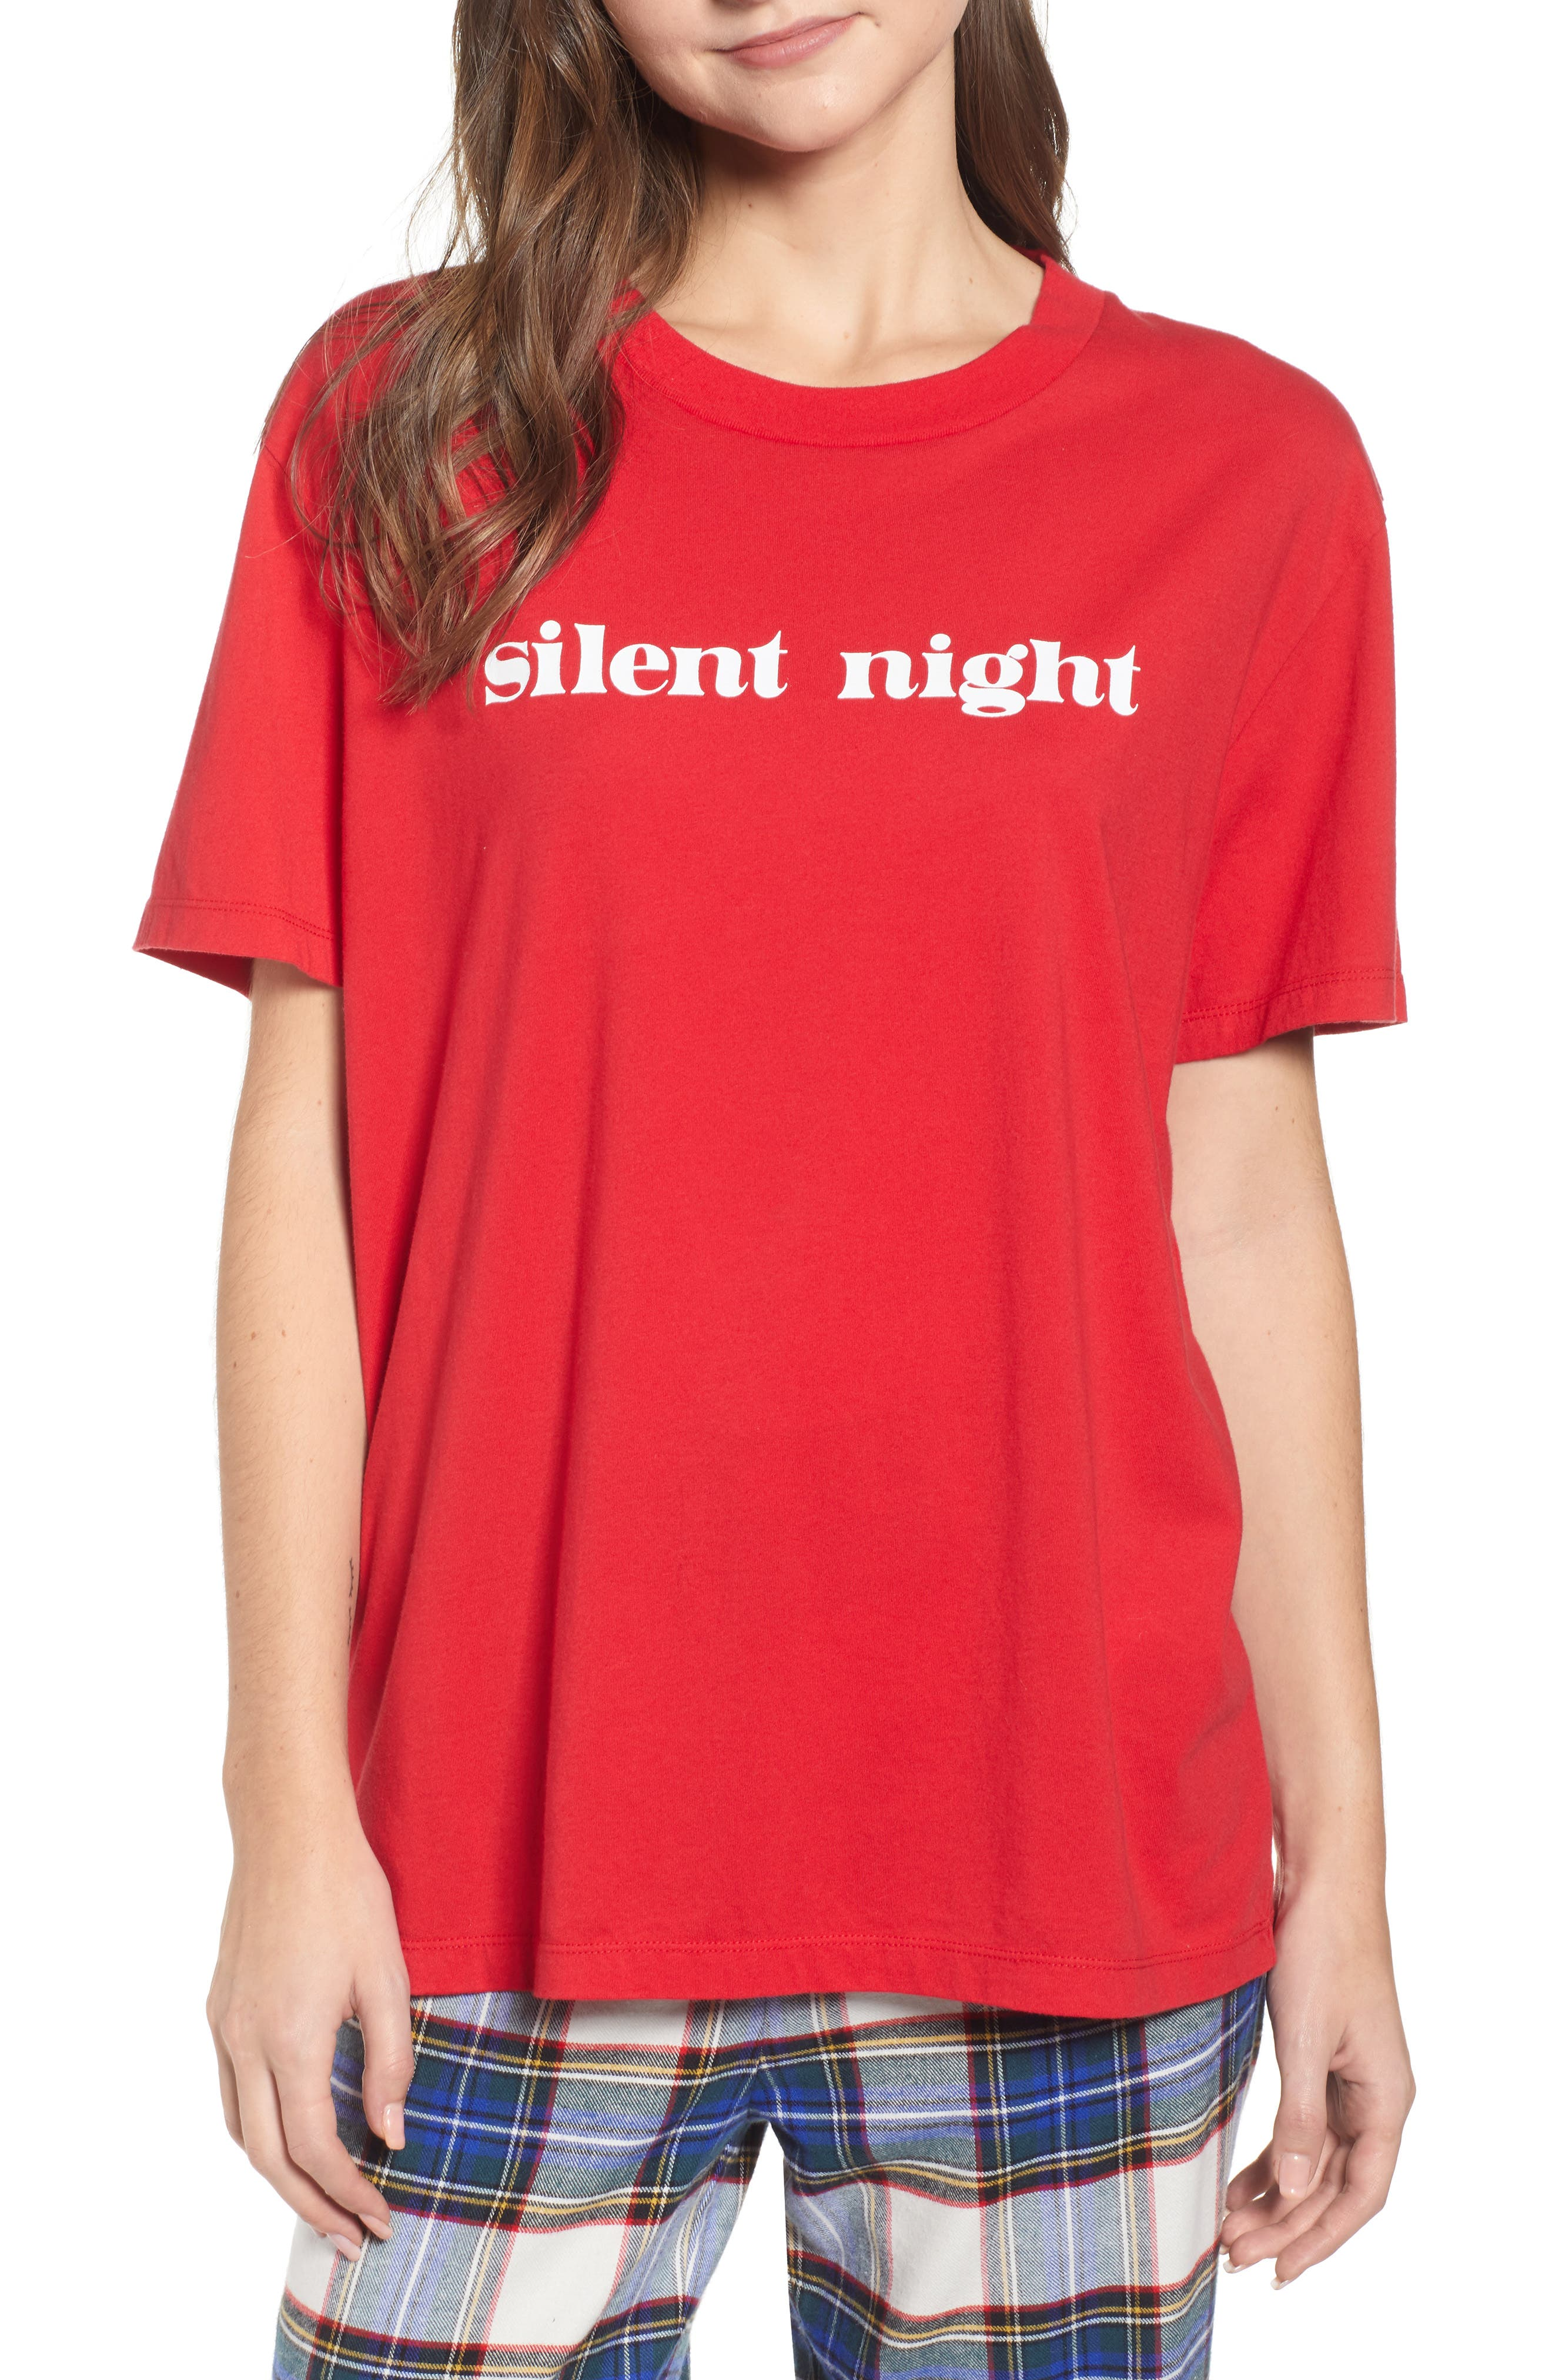 Sleepy Jones Silent Night Tee, Red